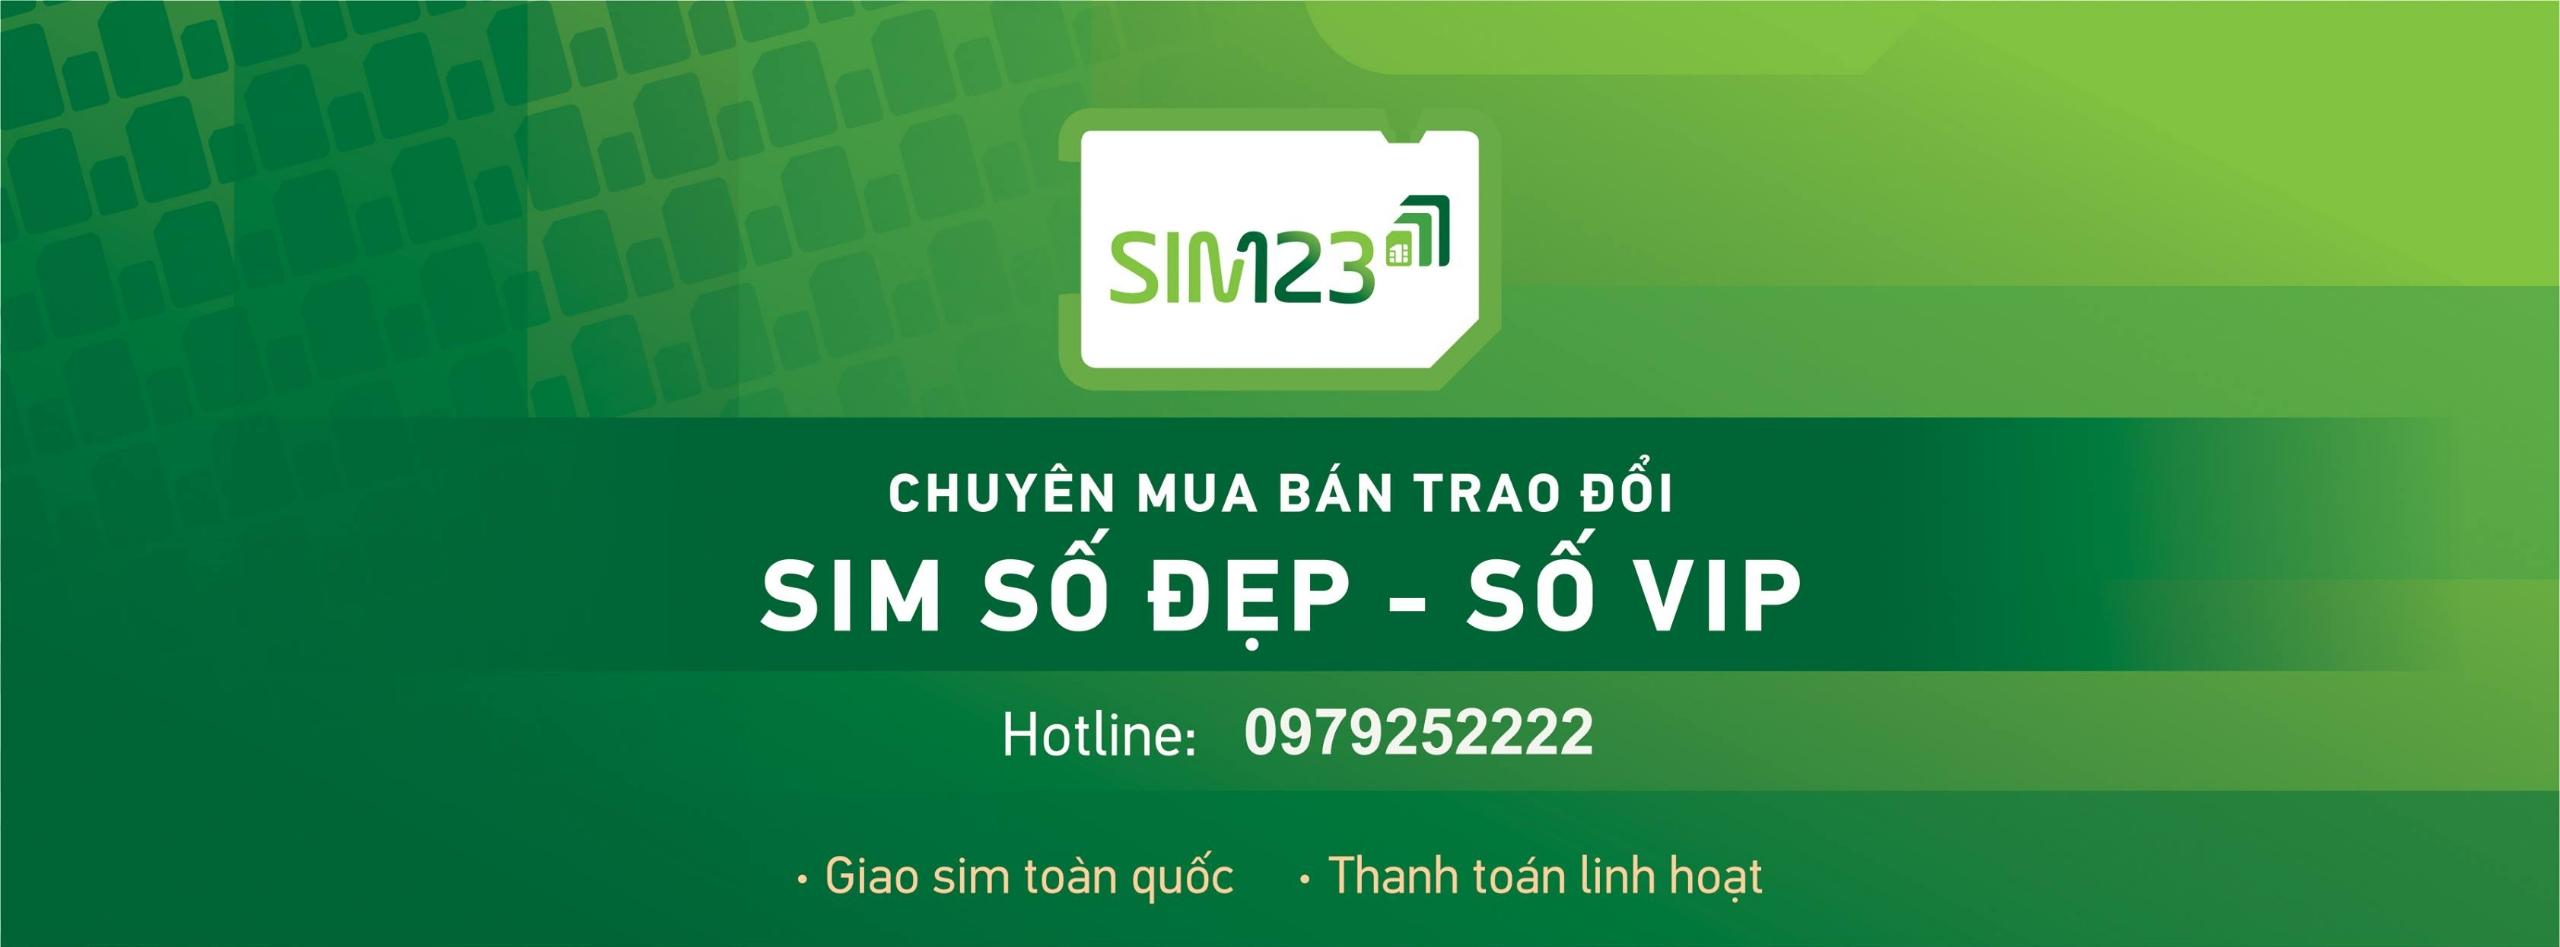 Sim123Vn Sim đẹp giá rẻ (@sim123vn) Cover Image